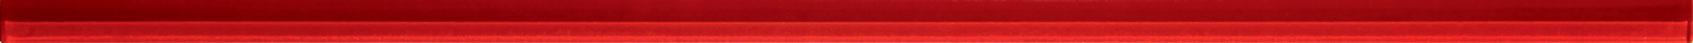 Travertino GLASS Red 1 szegő 59,8×1,5